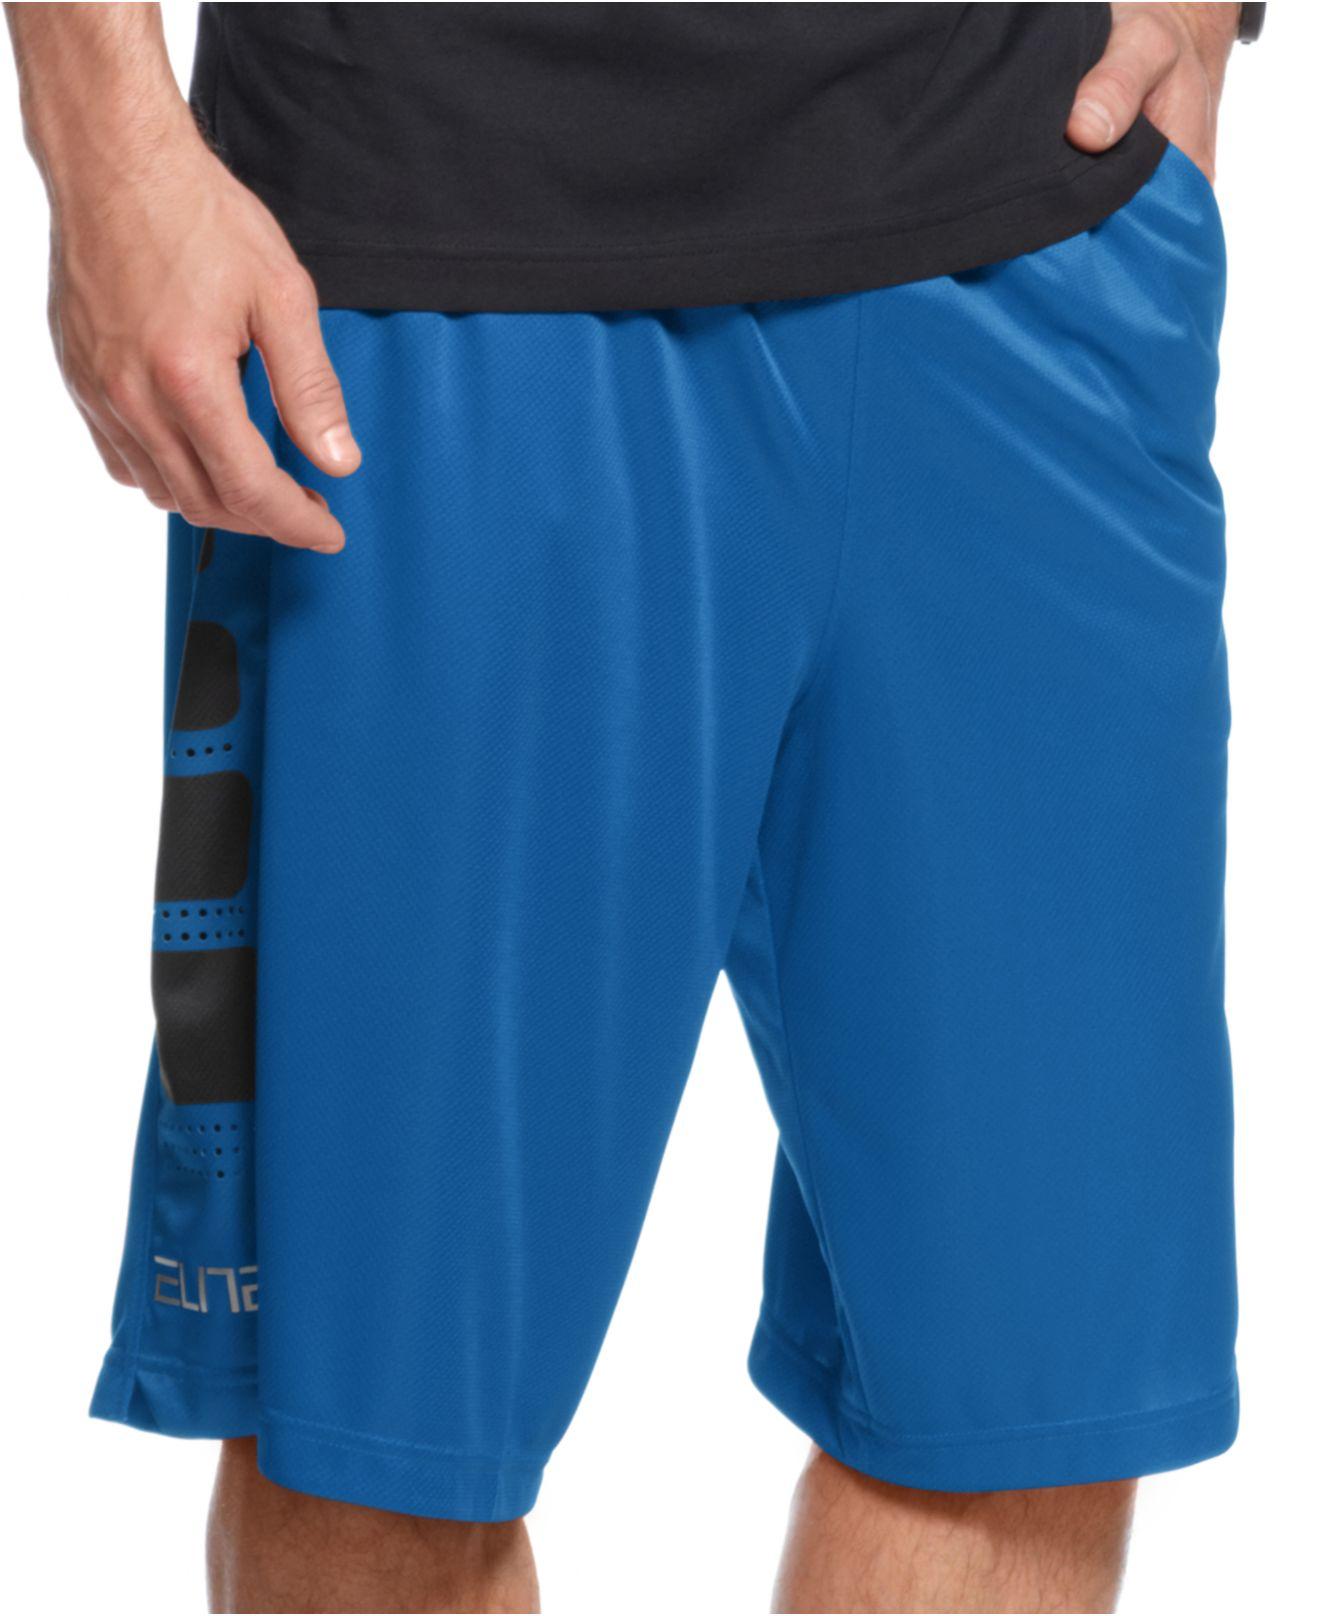 065f548ba525 Lyst - Nike Men s Elite Stripe 12